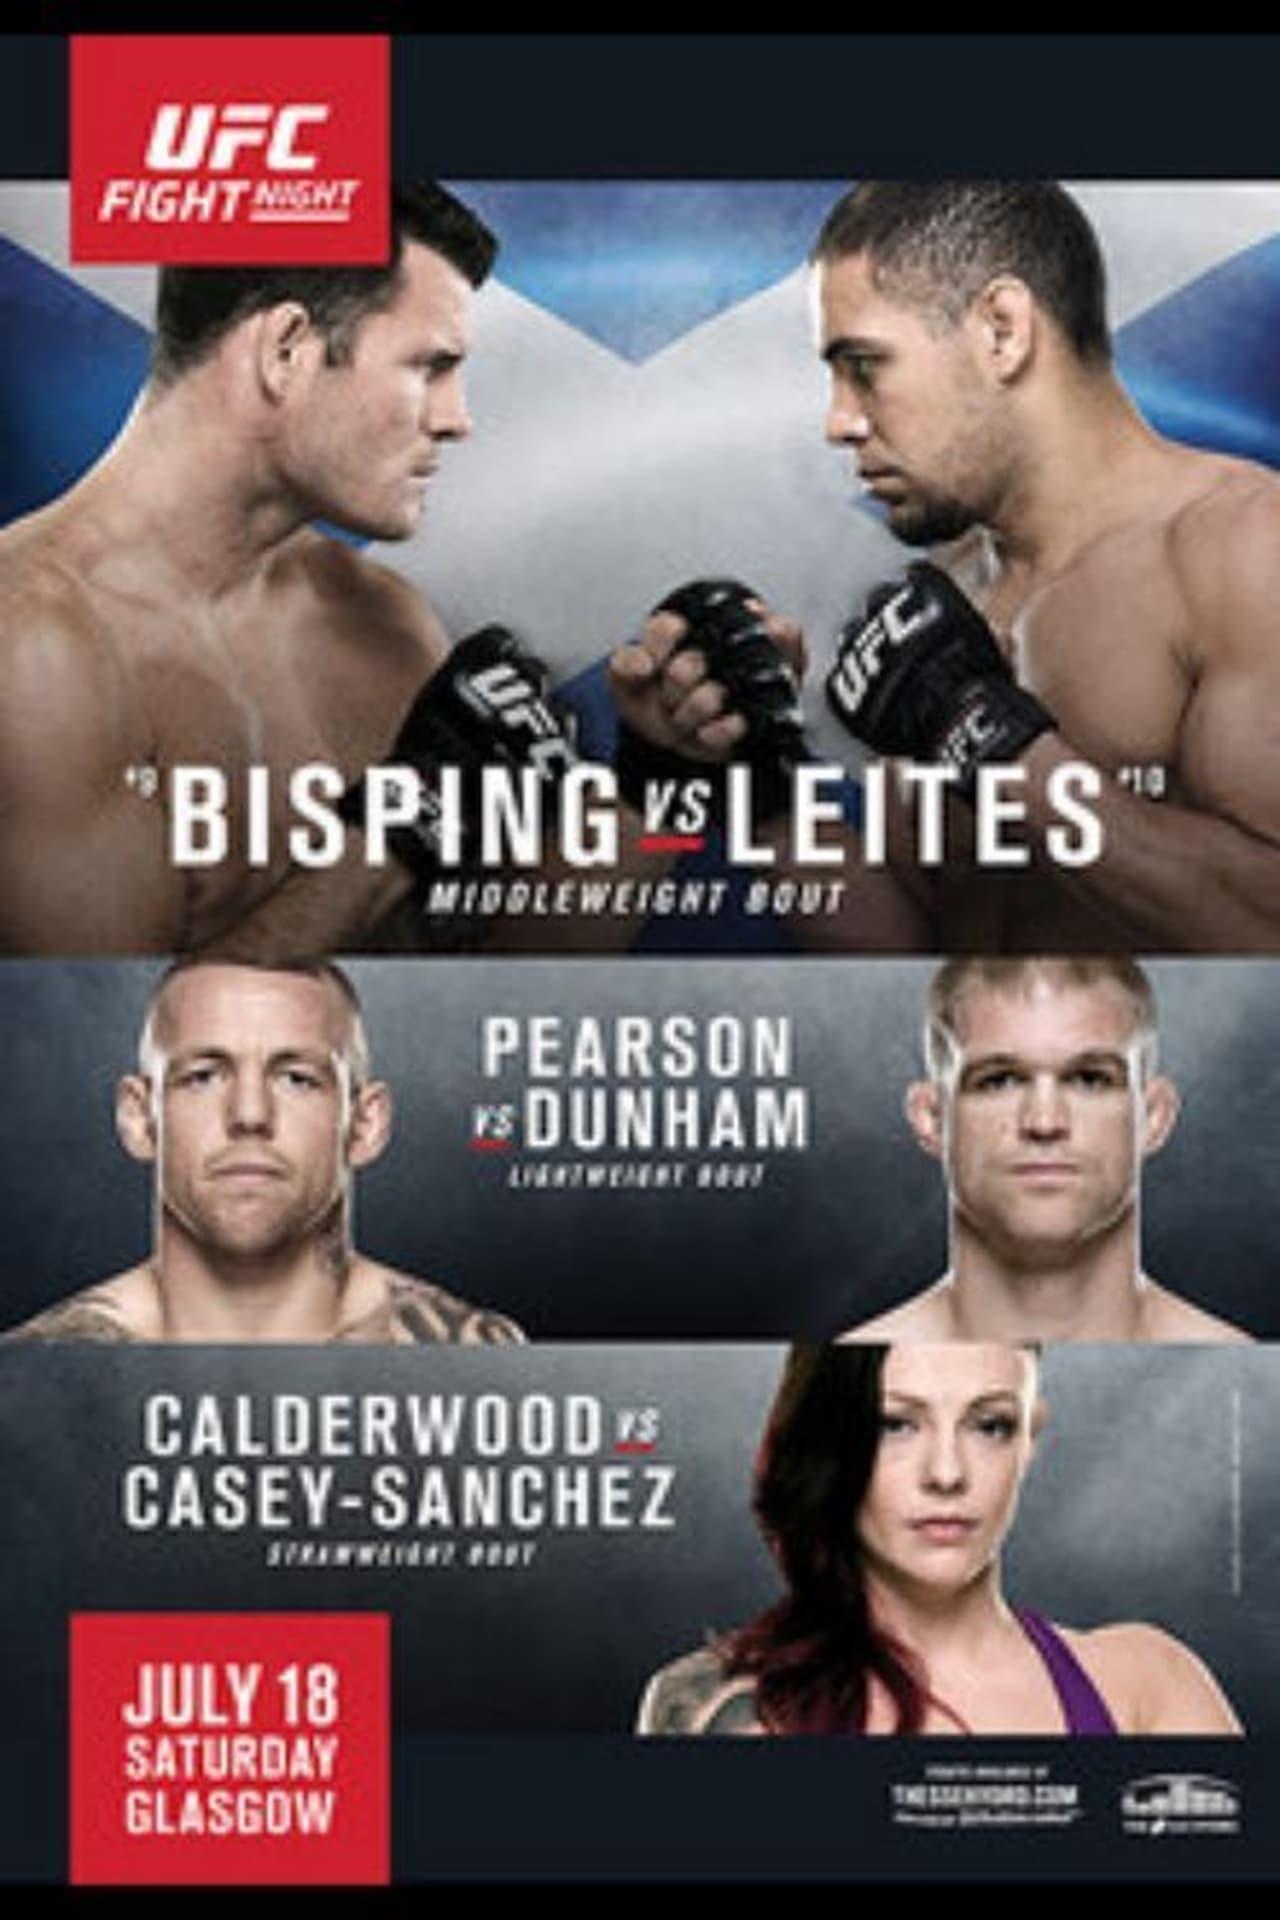 UFC Fight Night 72: Bisping vs. Leites